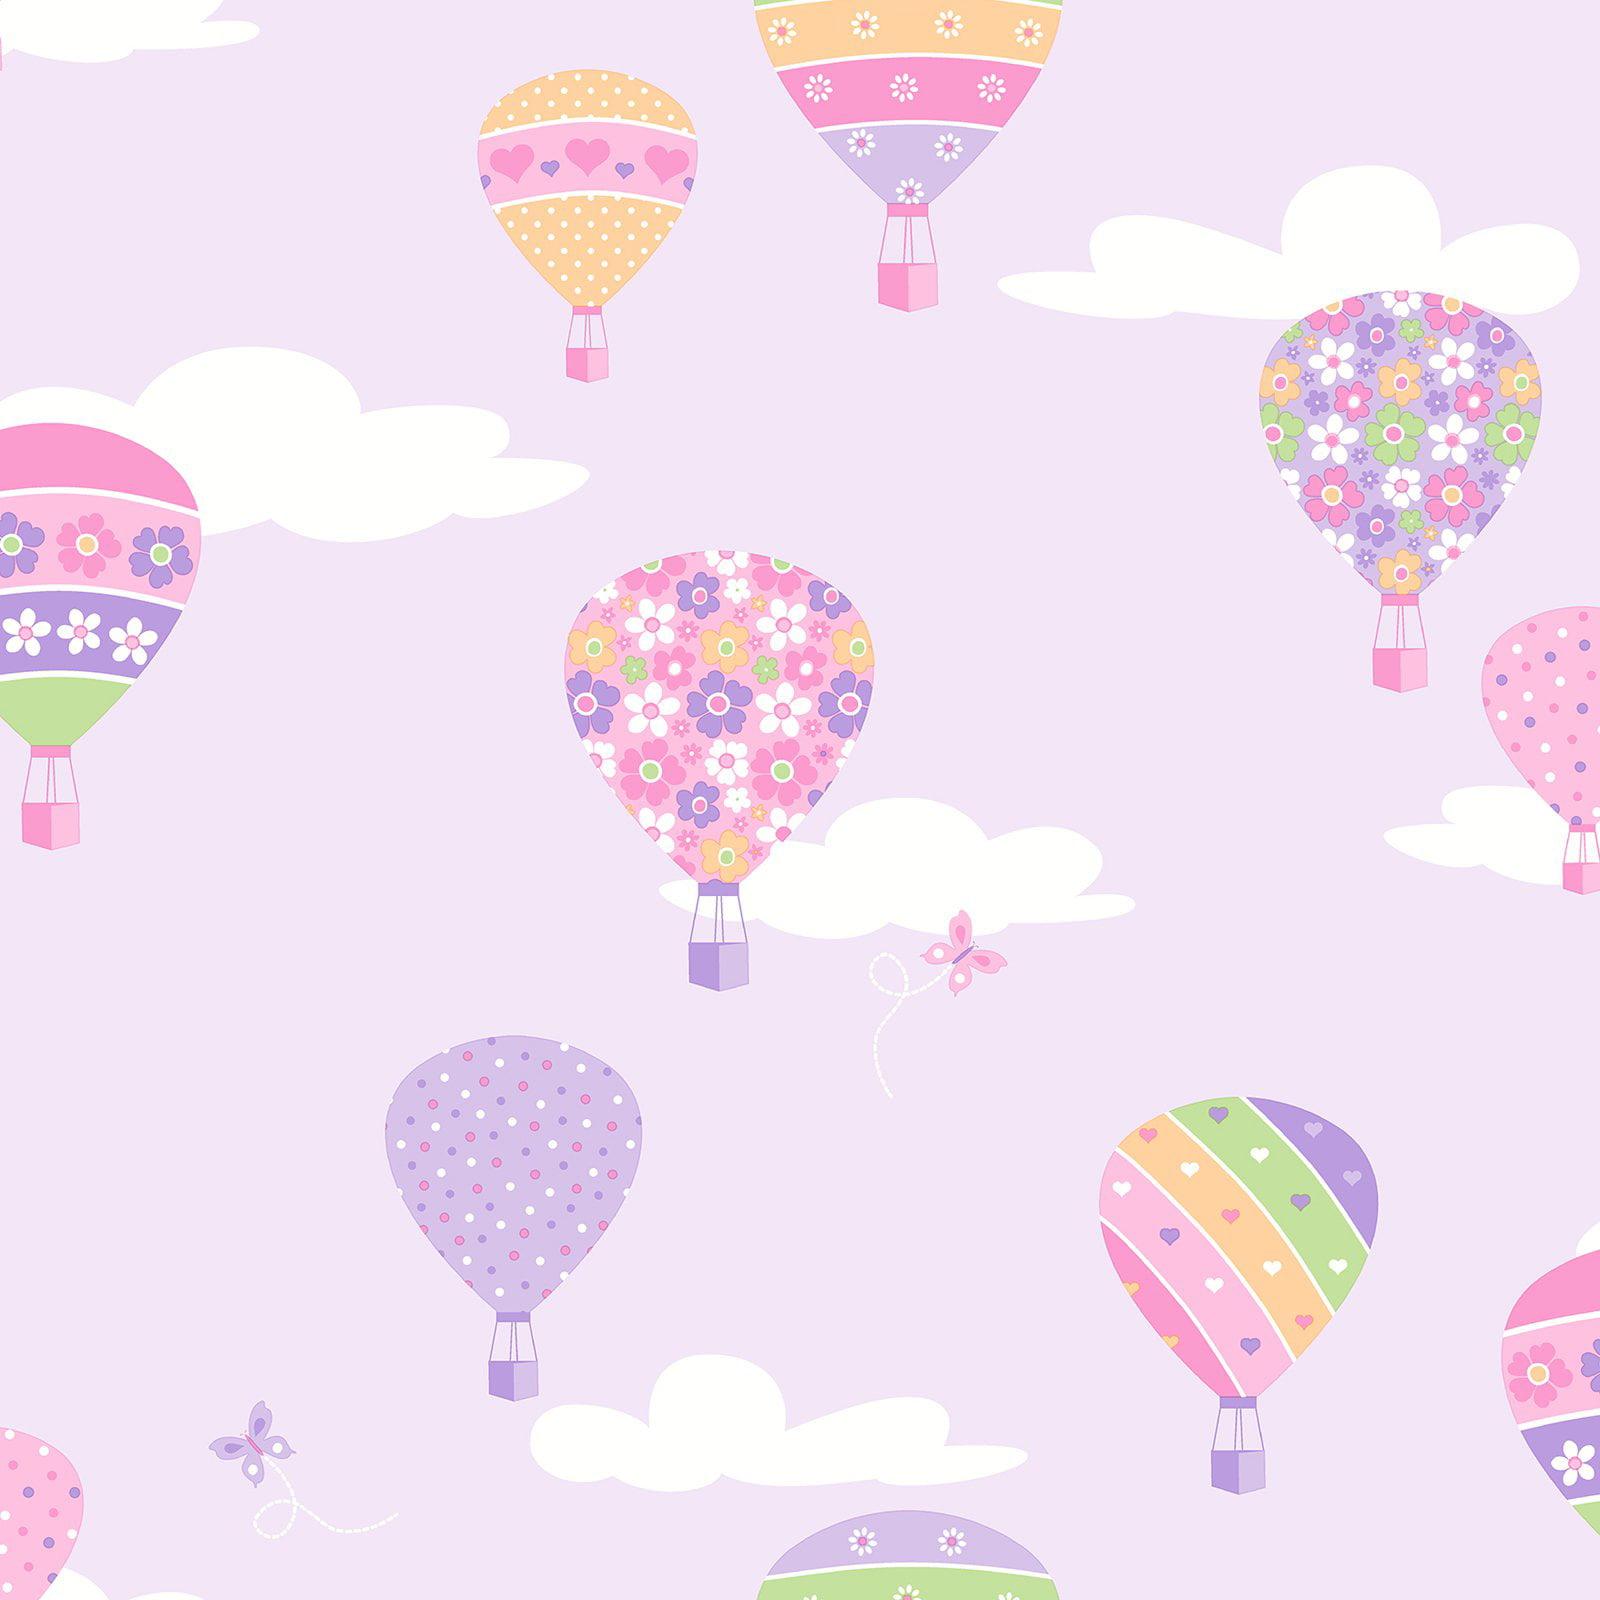 Brewster Hot Air Balloons Lilac Balloons Wallpaper